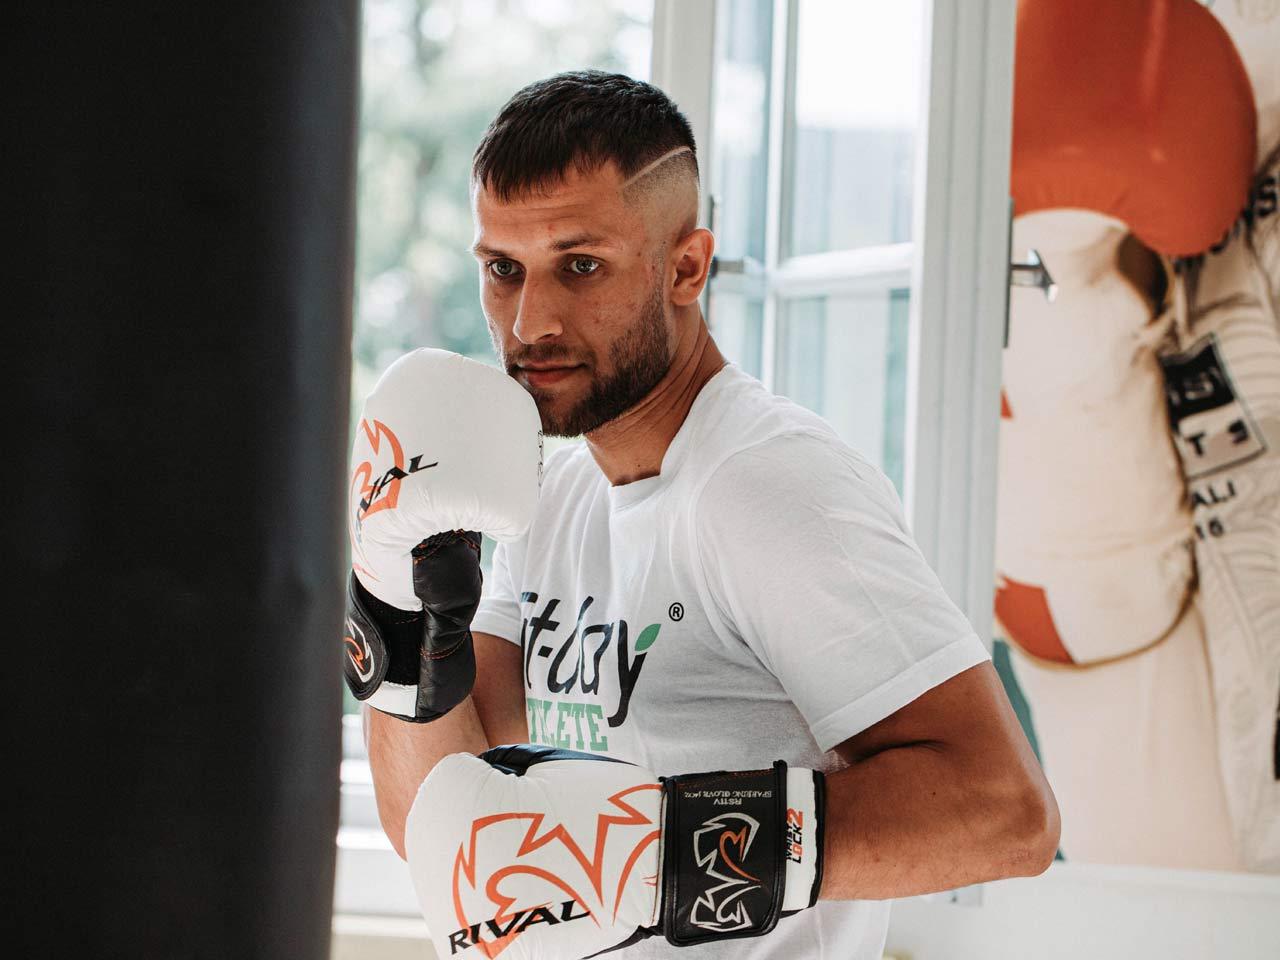 Pavel Polakovič - boxer